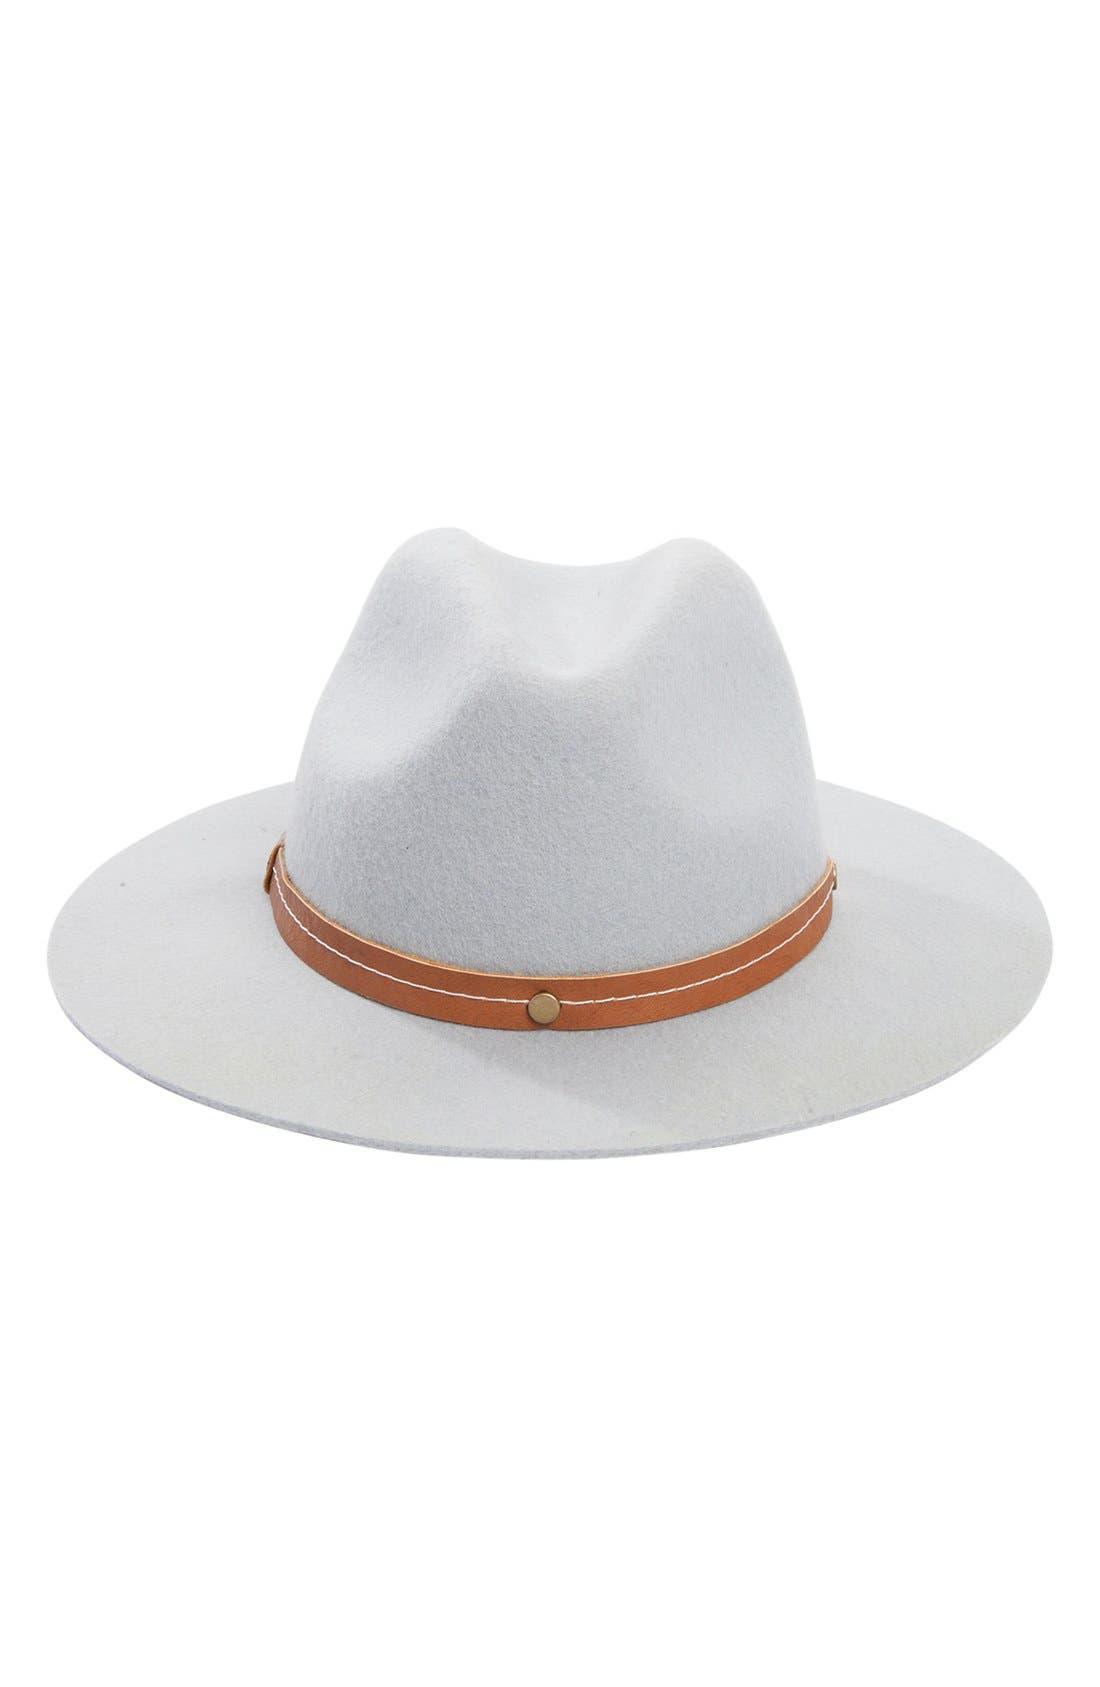 Main Image - Billabong 'Moon Gaze' Wool Panama Hat